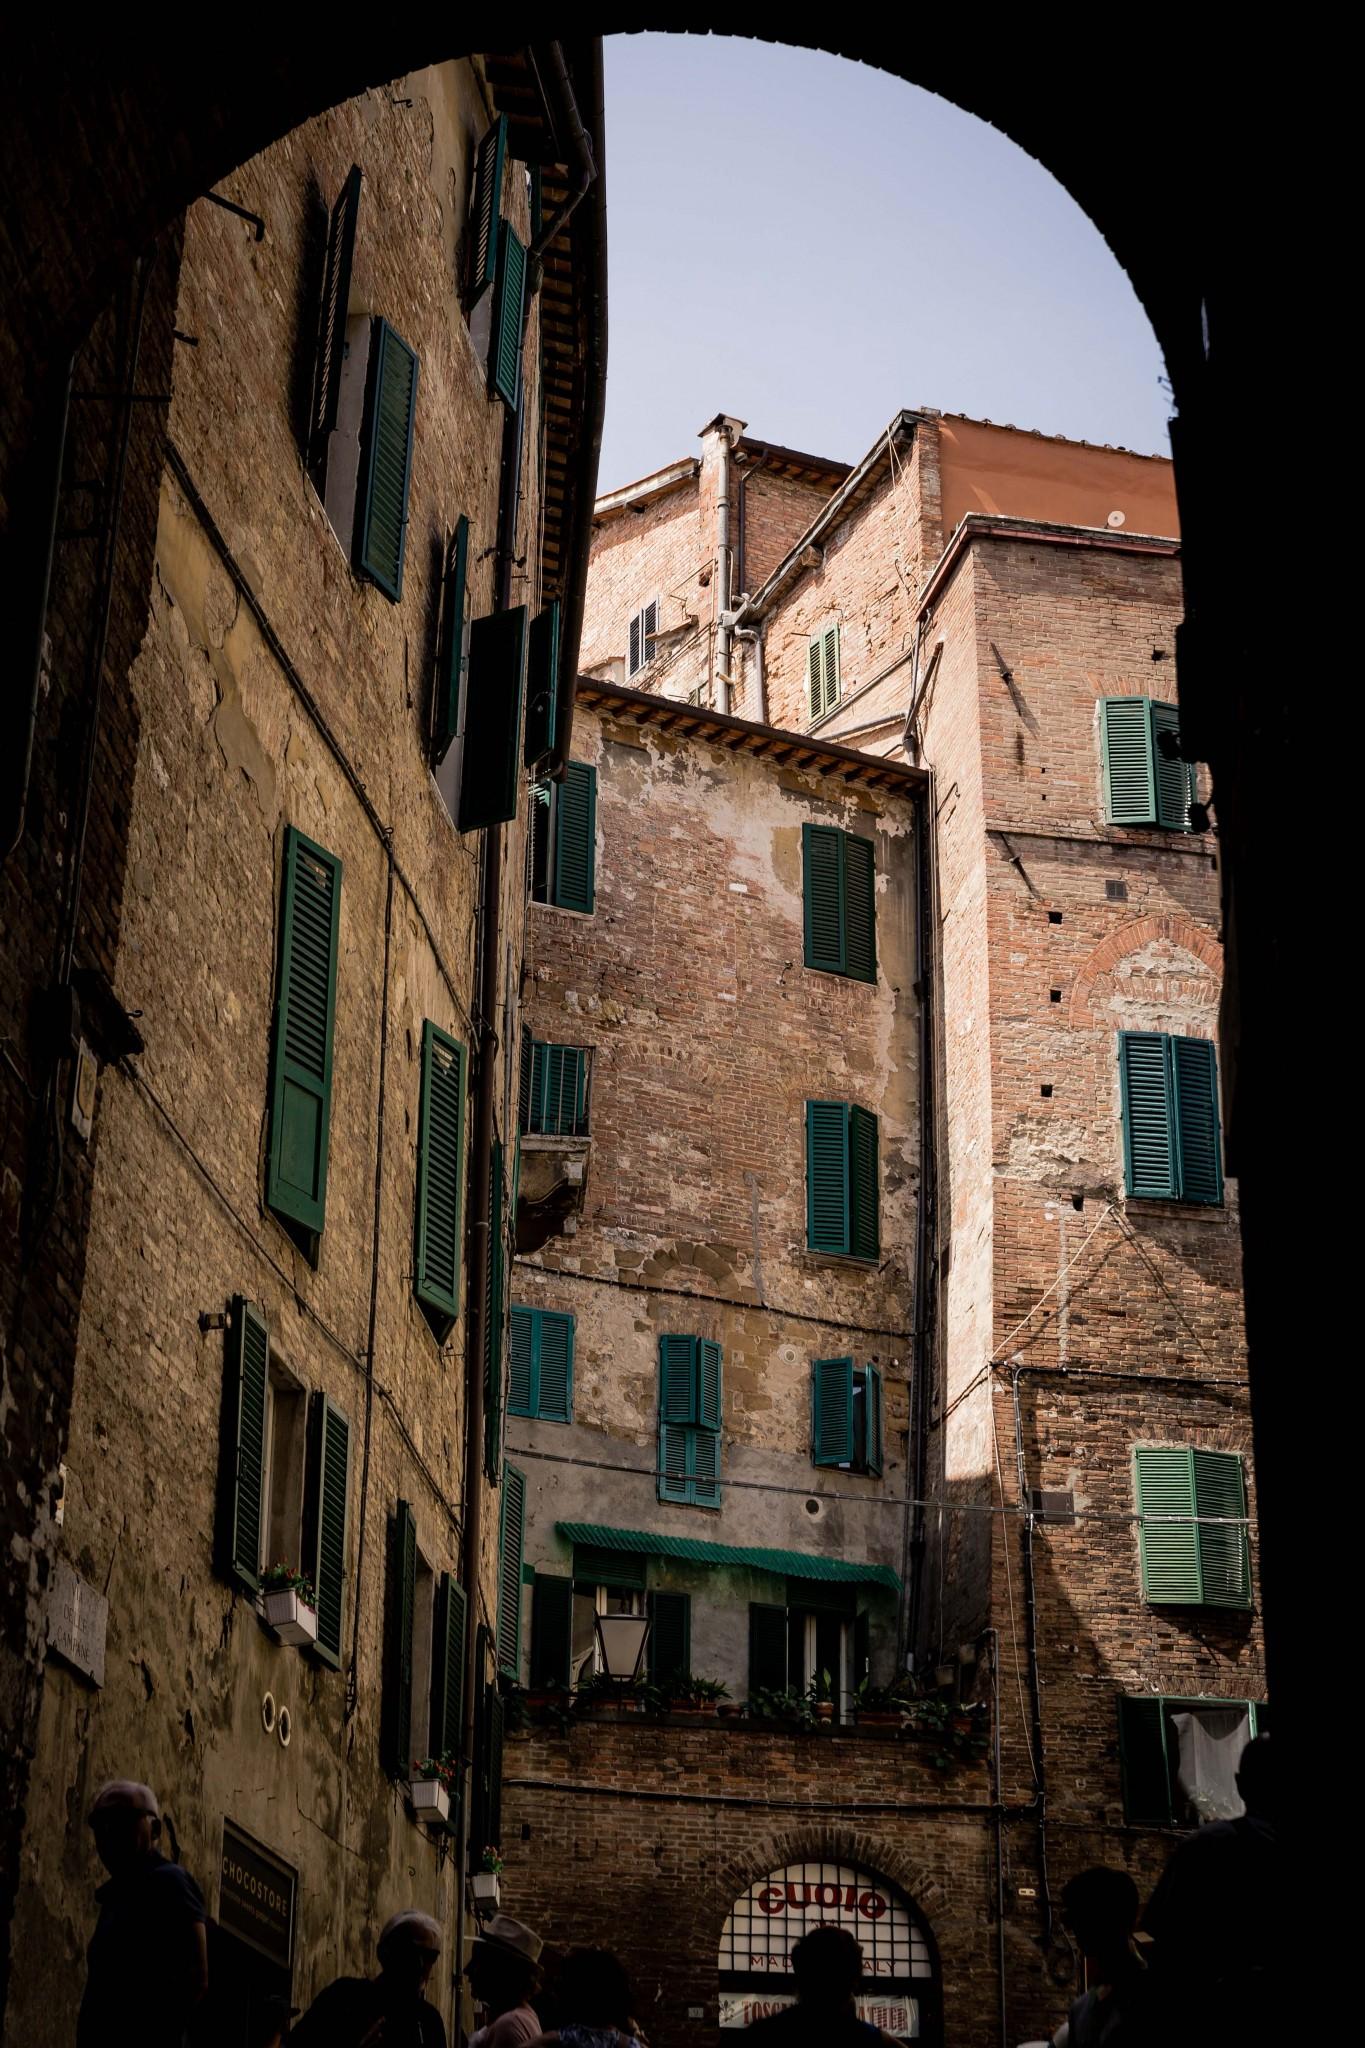 tuscany2 (20 of 39)